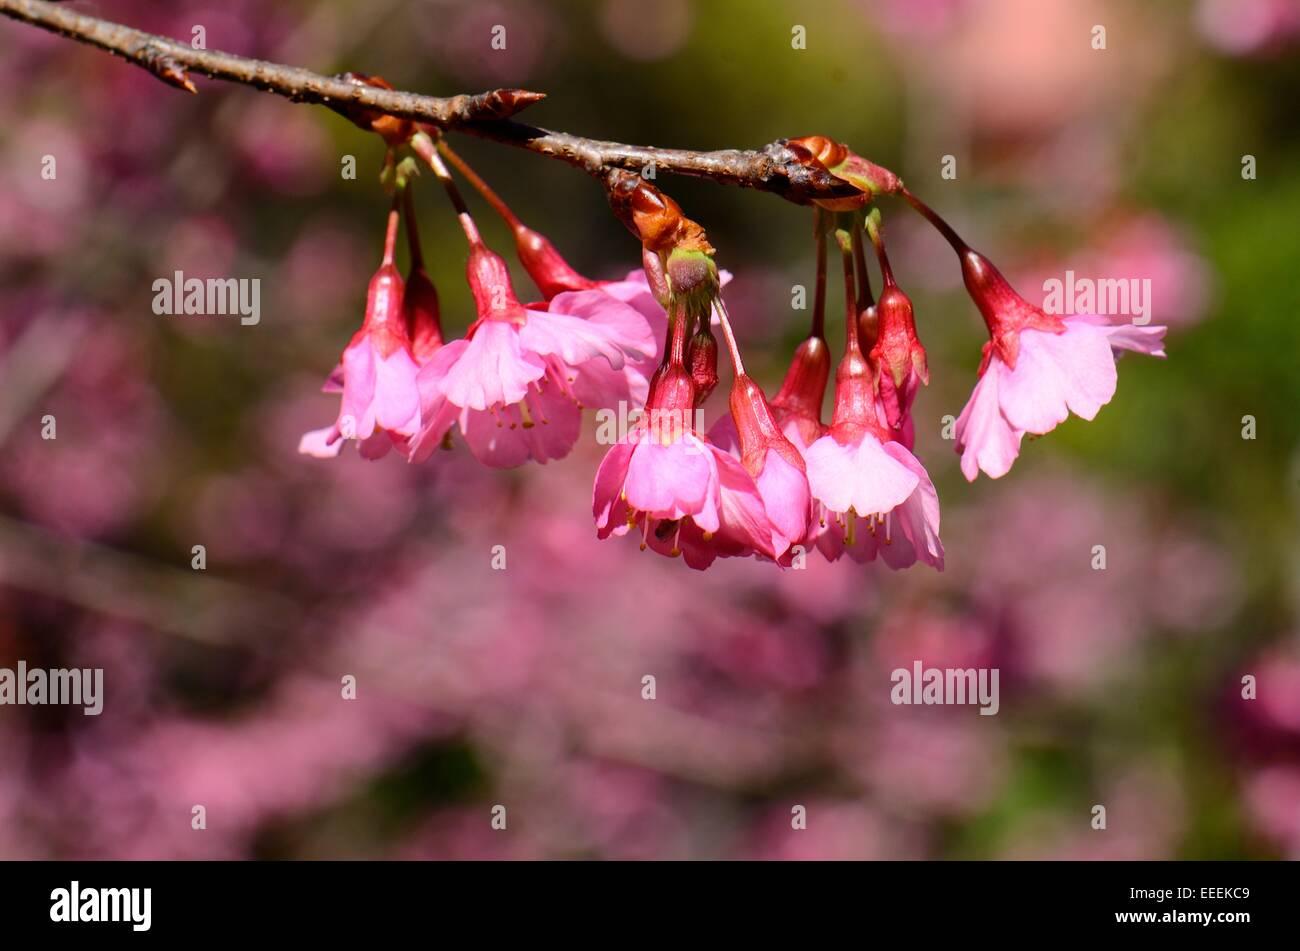 beautiful Wild Himalayan Cherry flower (Prunus cerasoides) at Thai flower garden - Stock Image